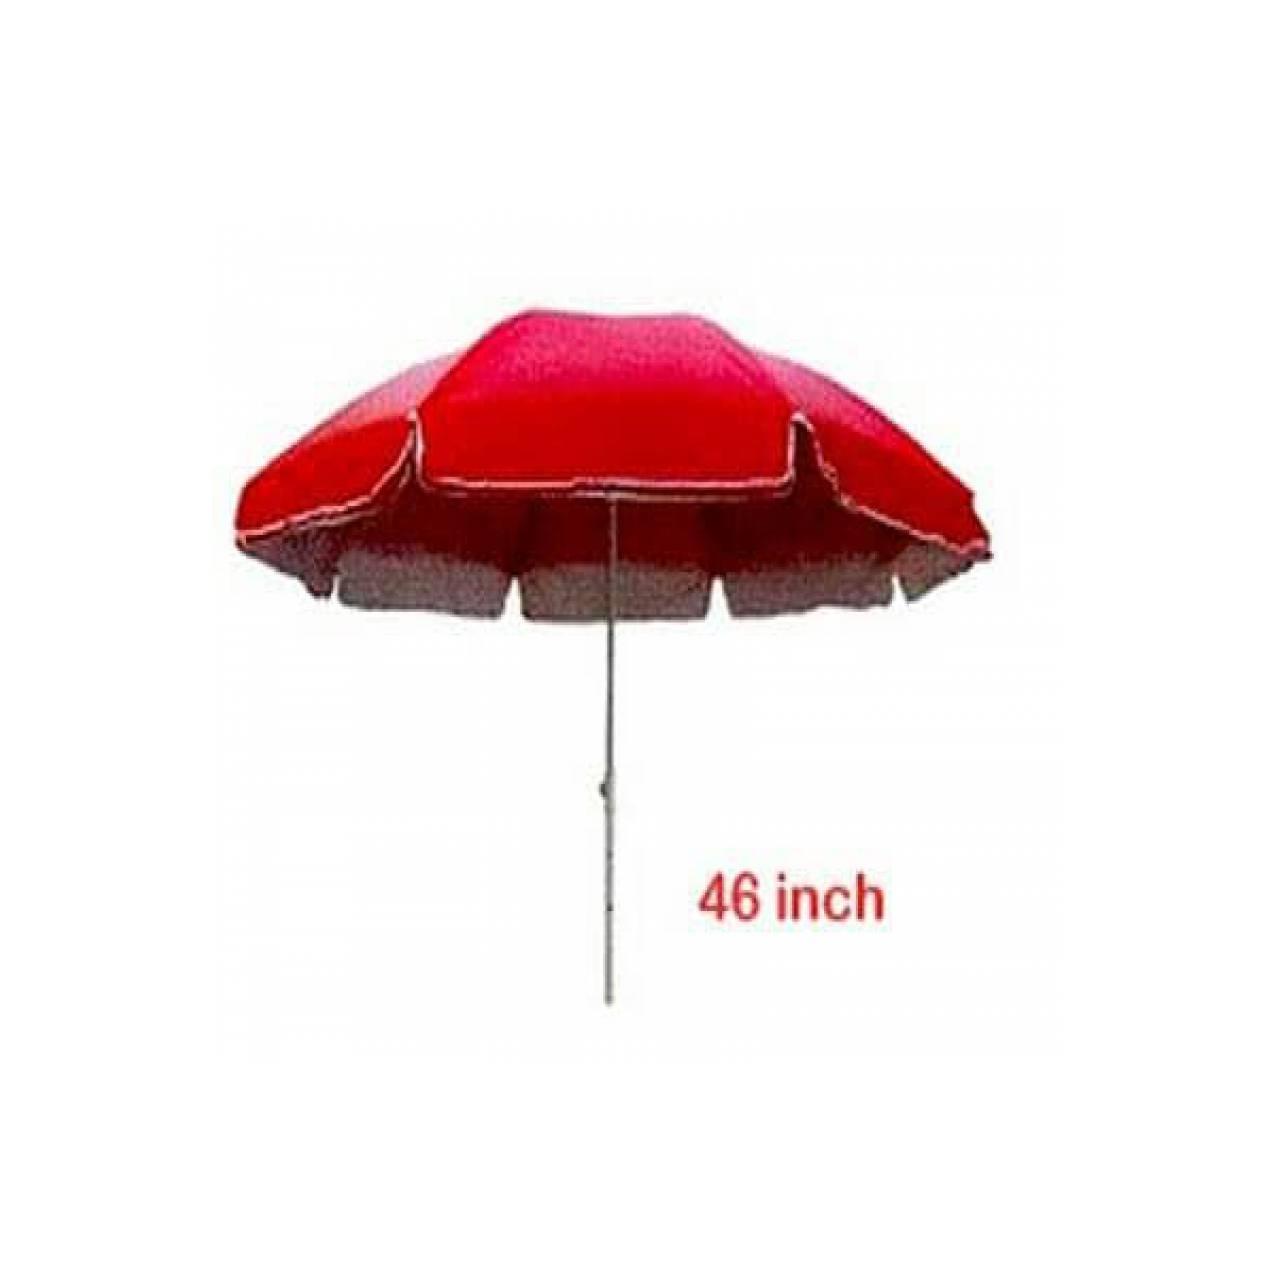 Payung Cafe Pantai Jualan Tenda Parasol 180cm Daftar Harga Pelangi Lapak An Dagang Kaki Lima Pkl Taman Stand Diameter 230cm 2lapis Bandung 46 230 Cm